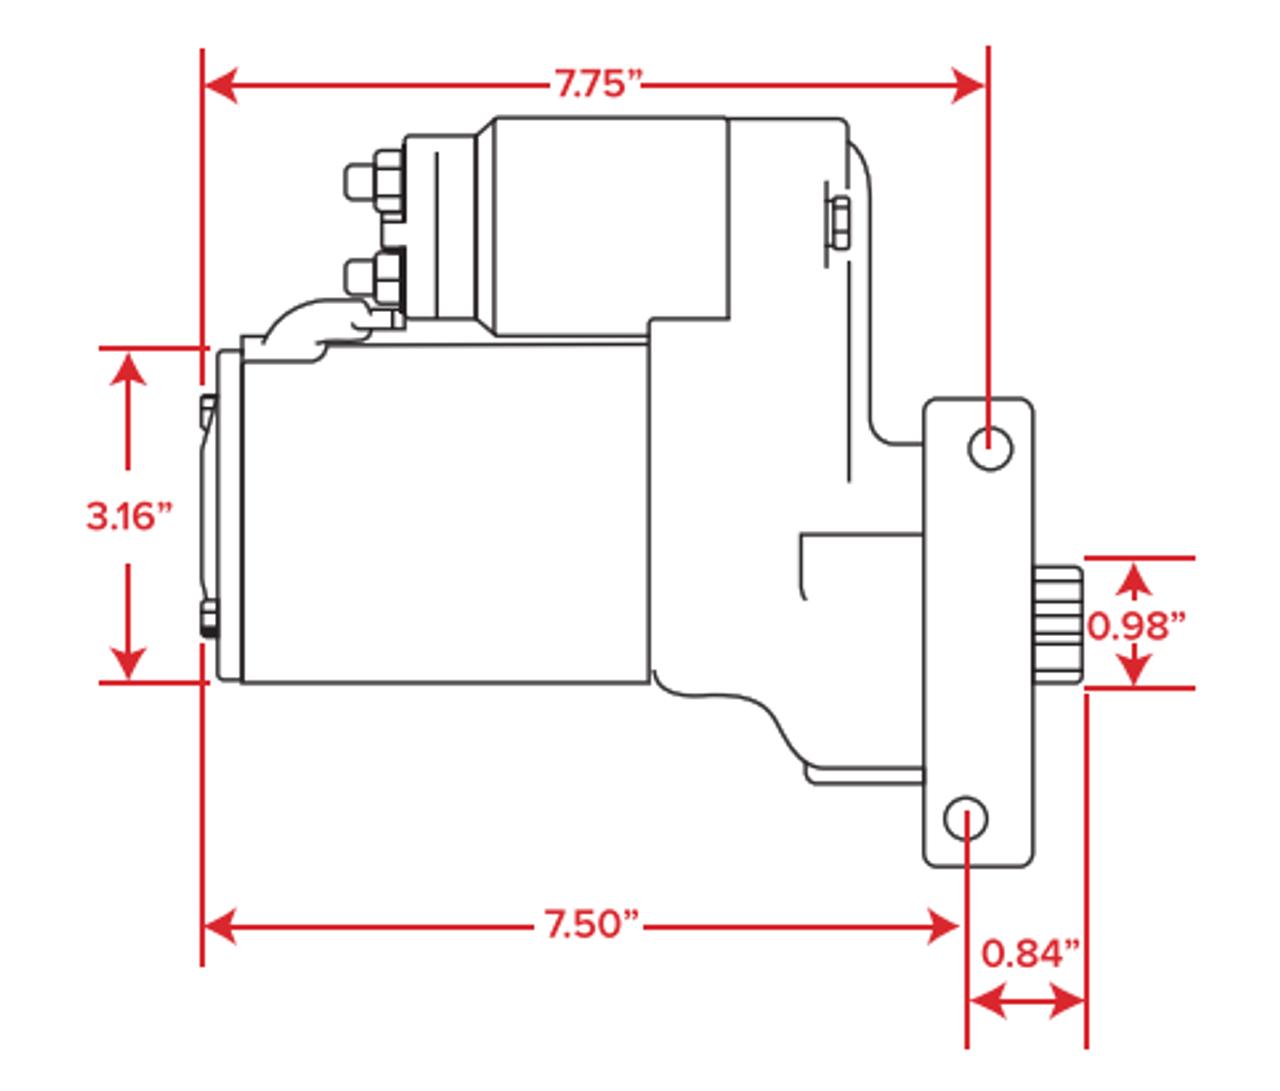 GM LSX High Torque Mini Starter - Red High Torque Mini Starter Wiring Diagram on